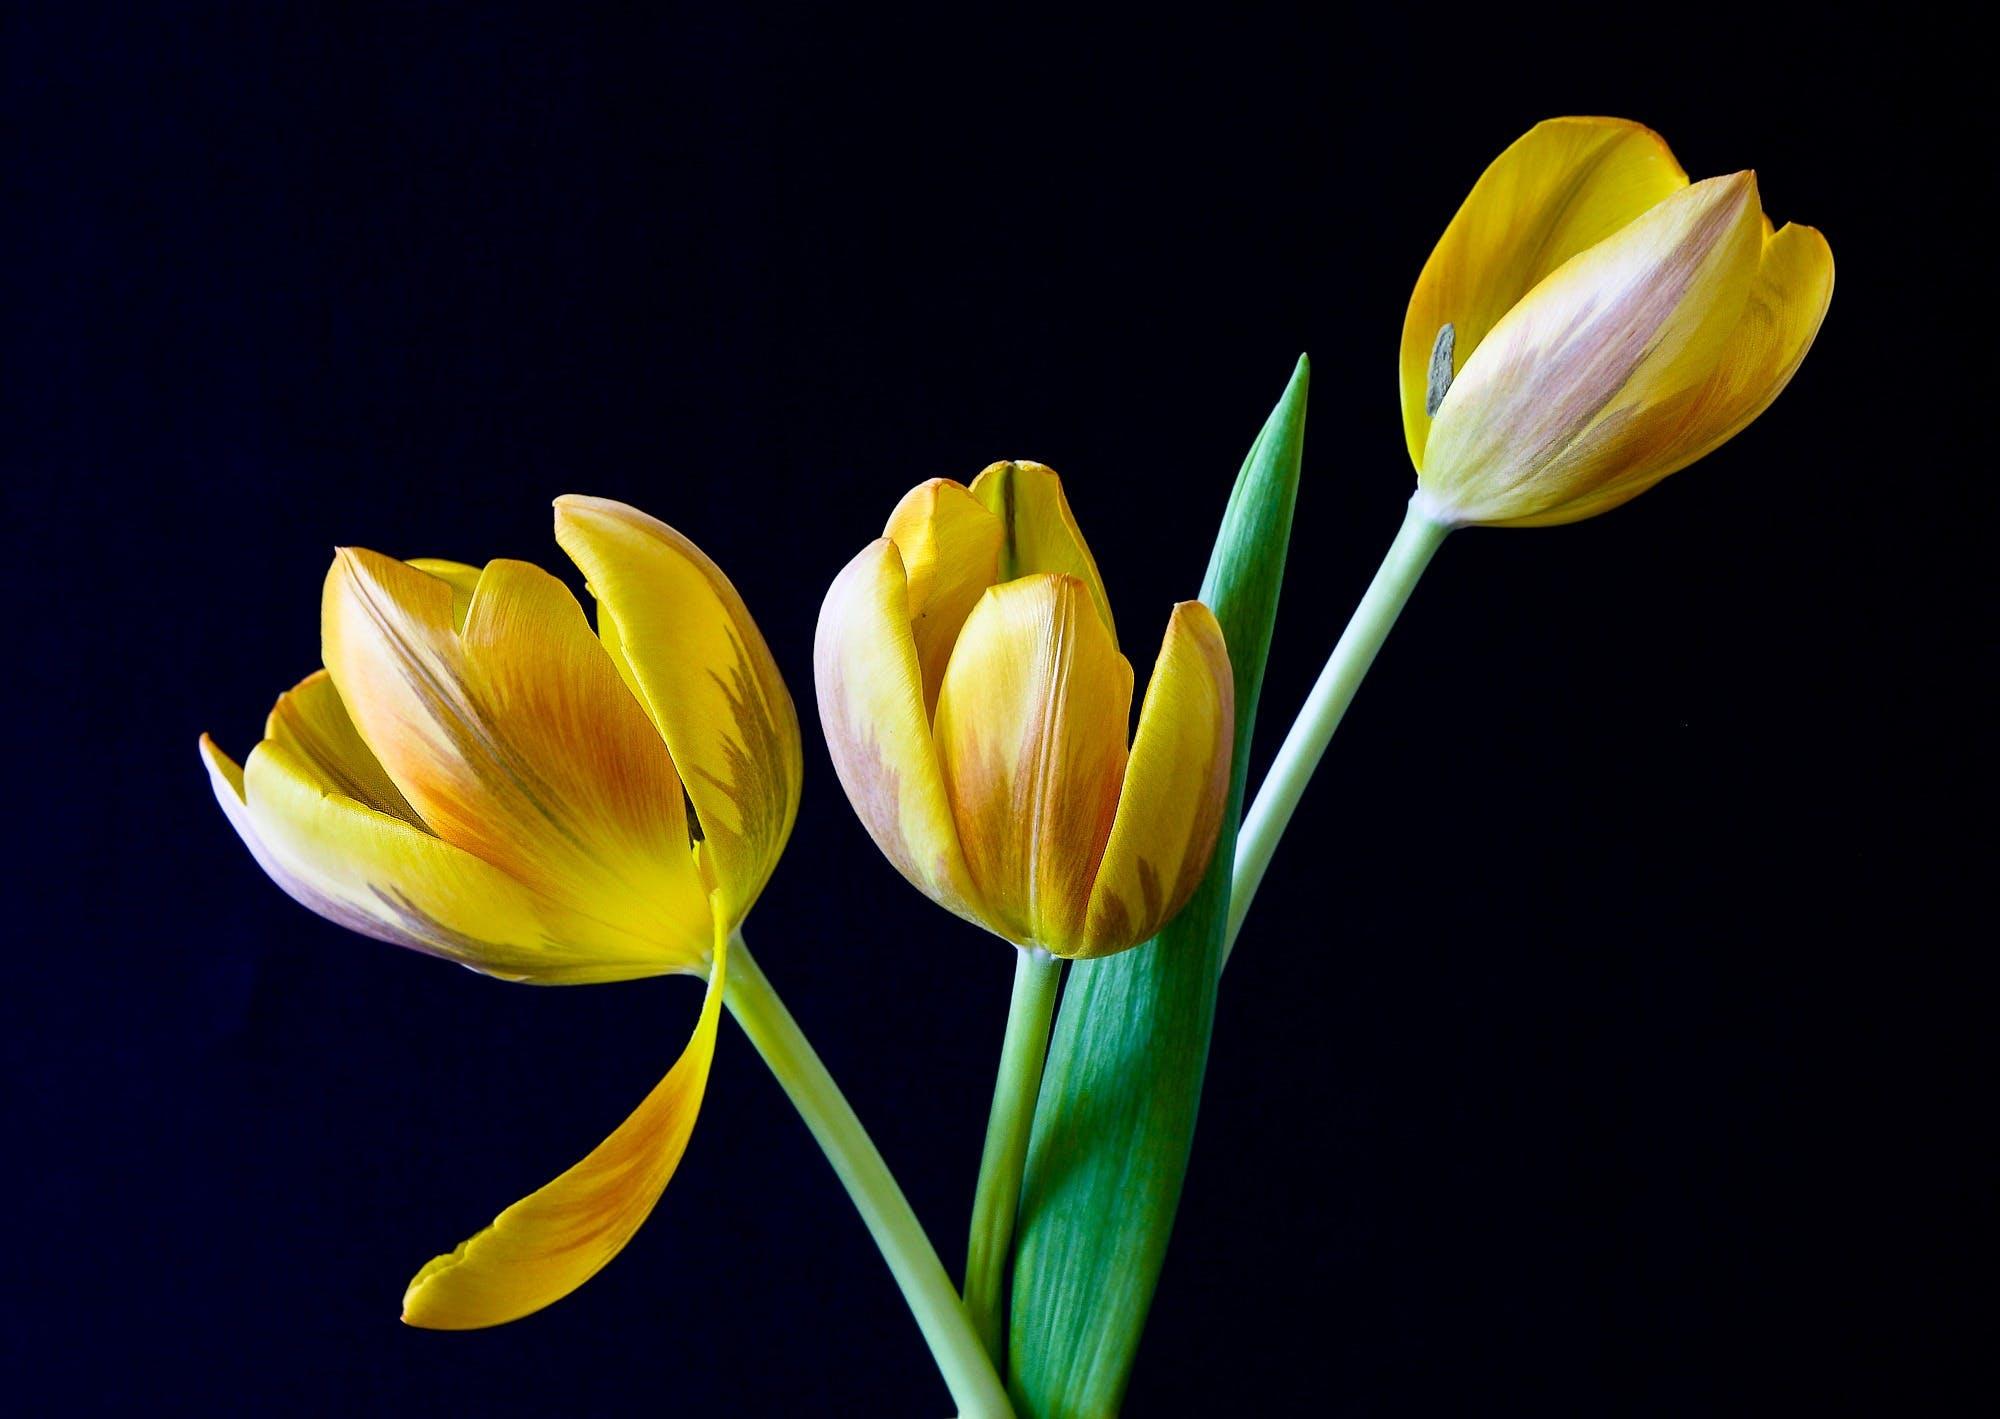 blumen, frühling, gelb